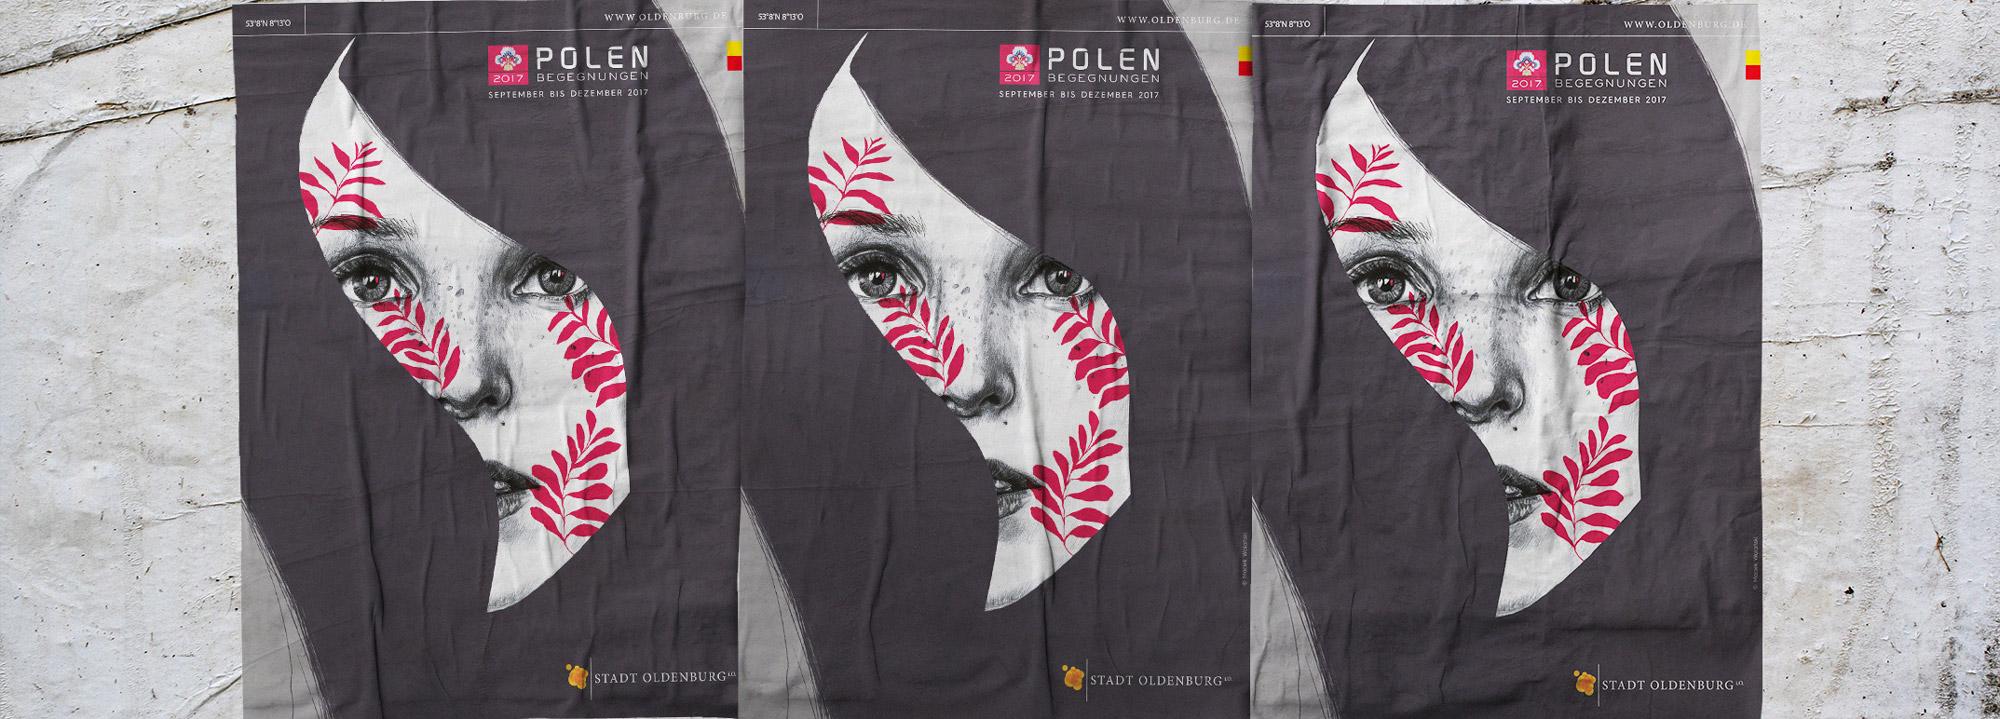 polen_begegnungen_posters